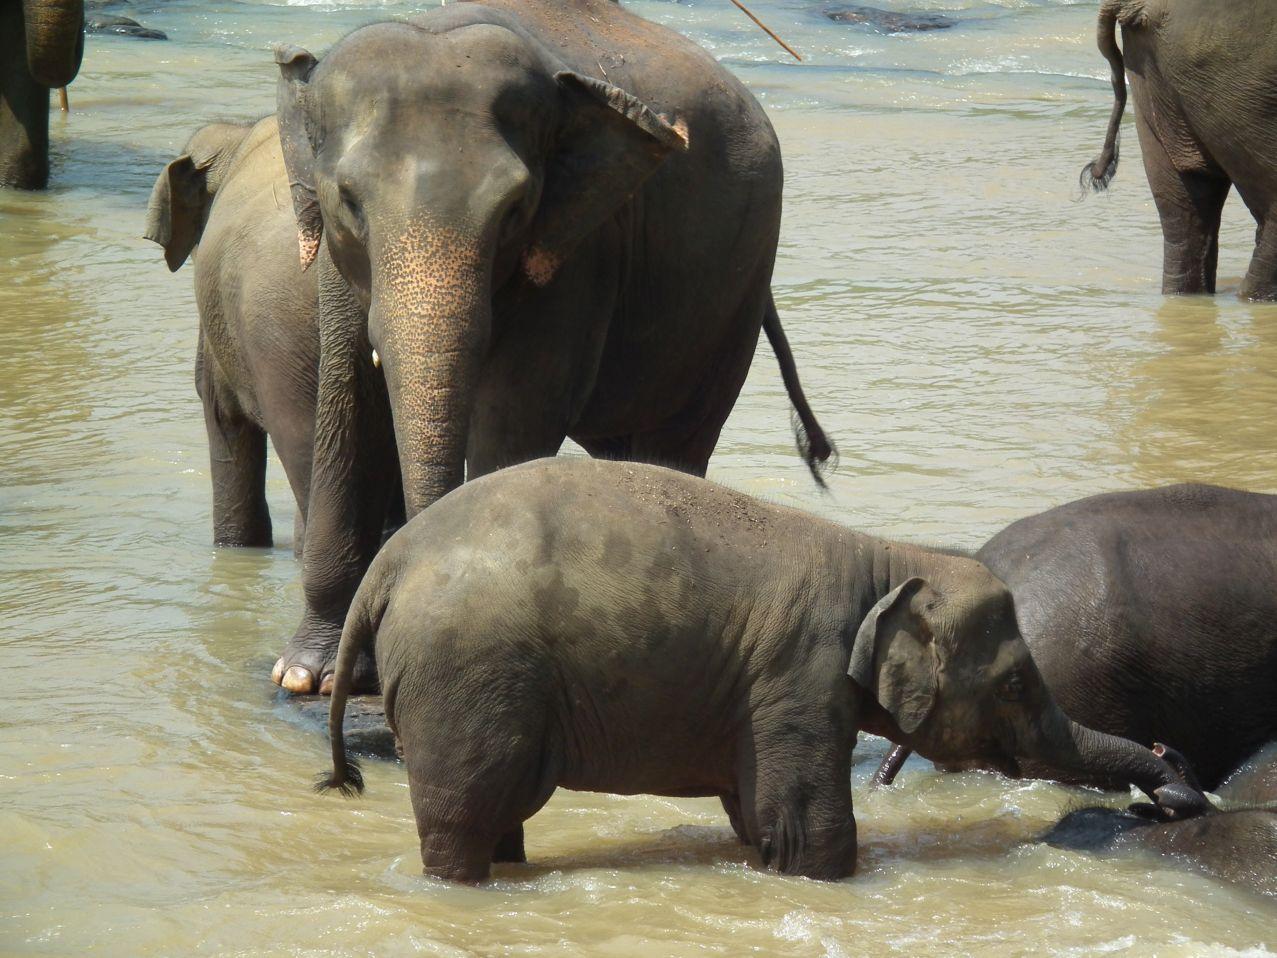 Kąpiel słoni, Pinnawela